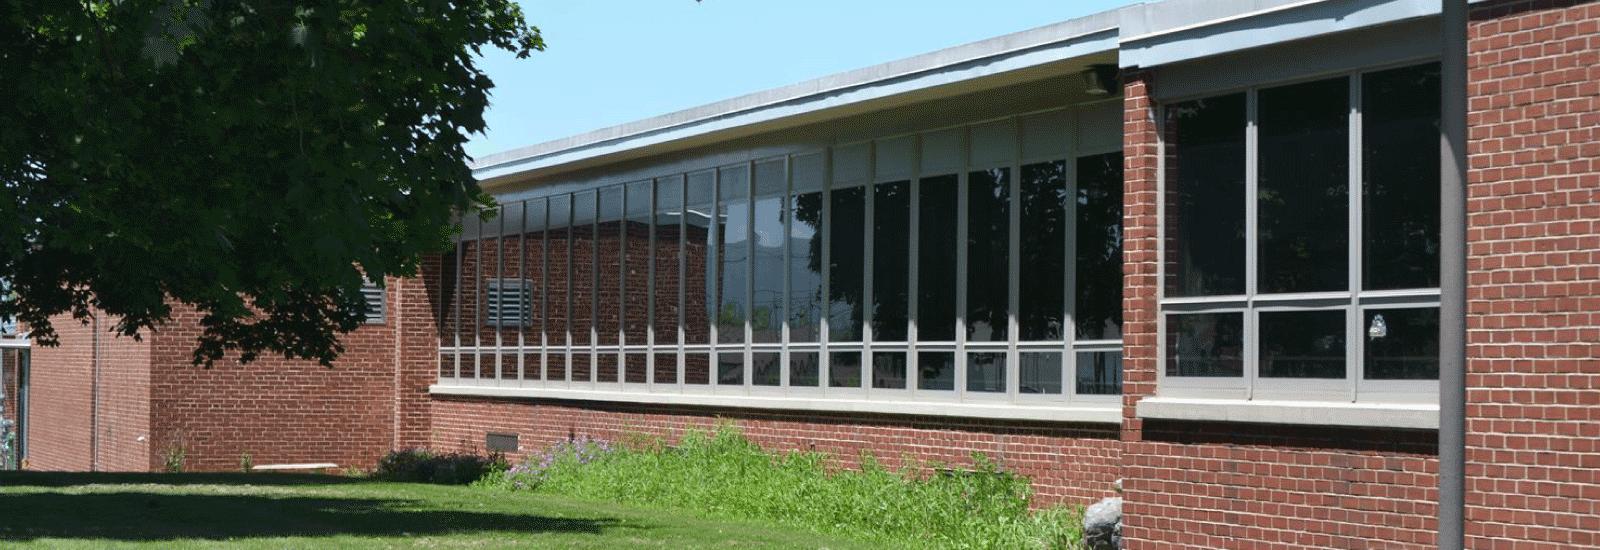 Corral Drive Elementary School, Rapid City, SD